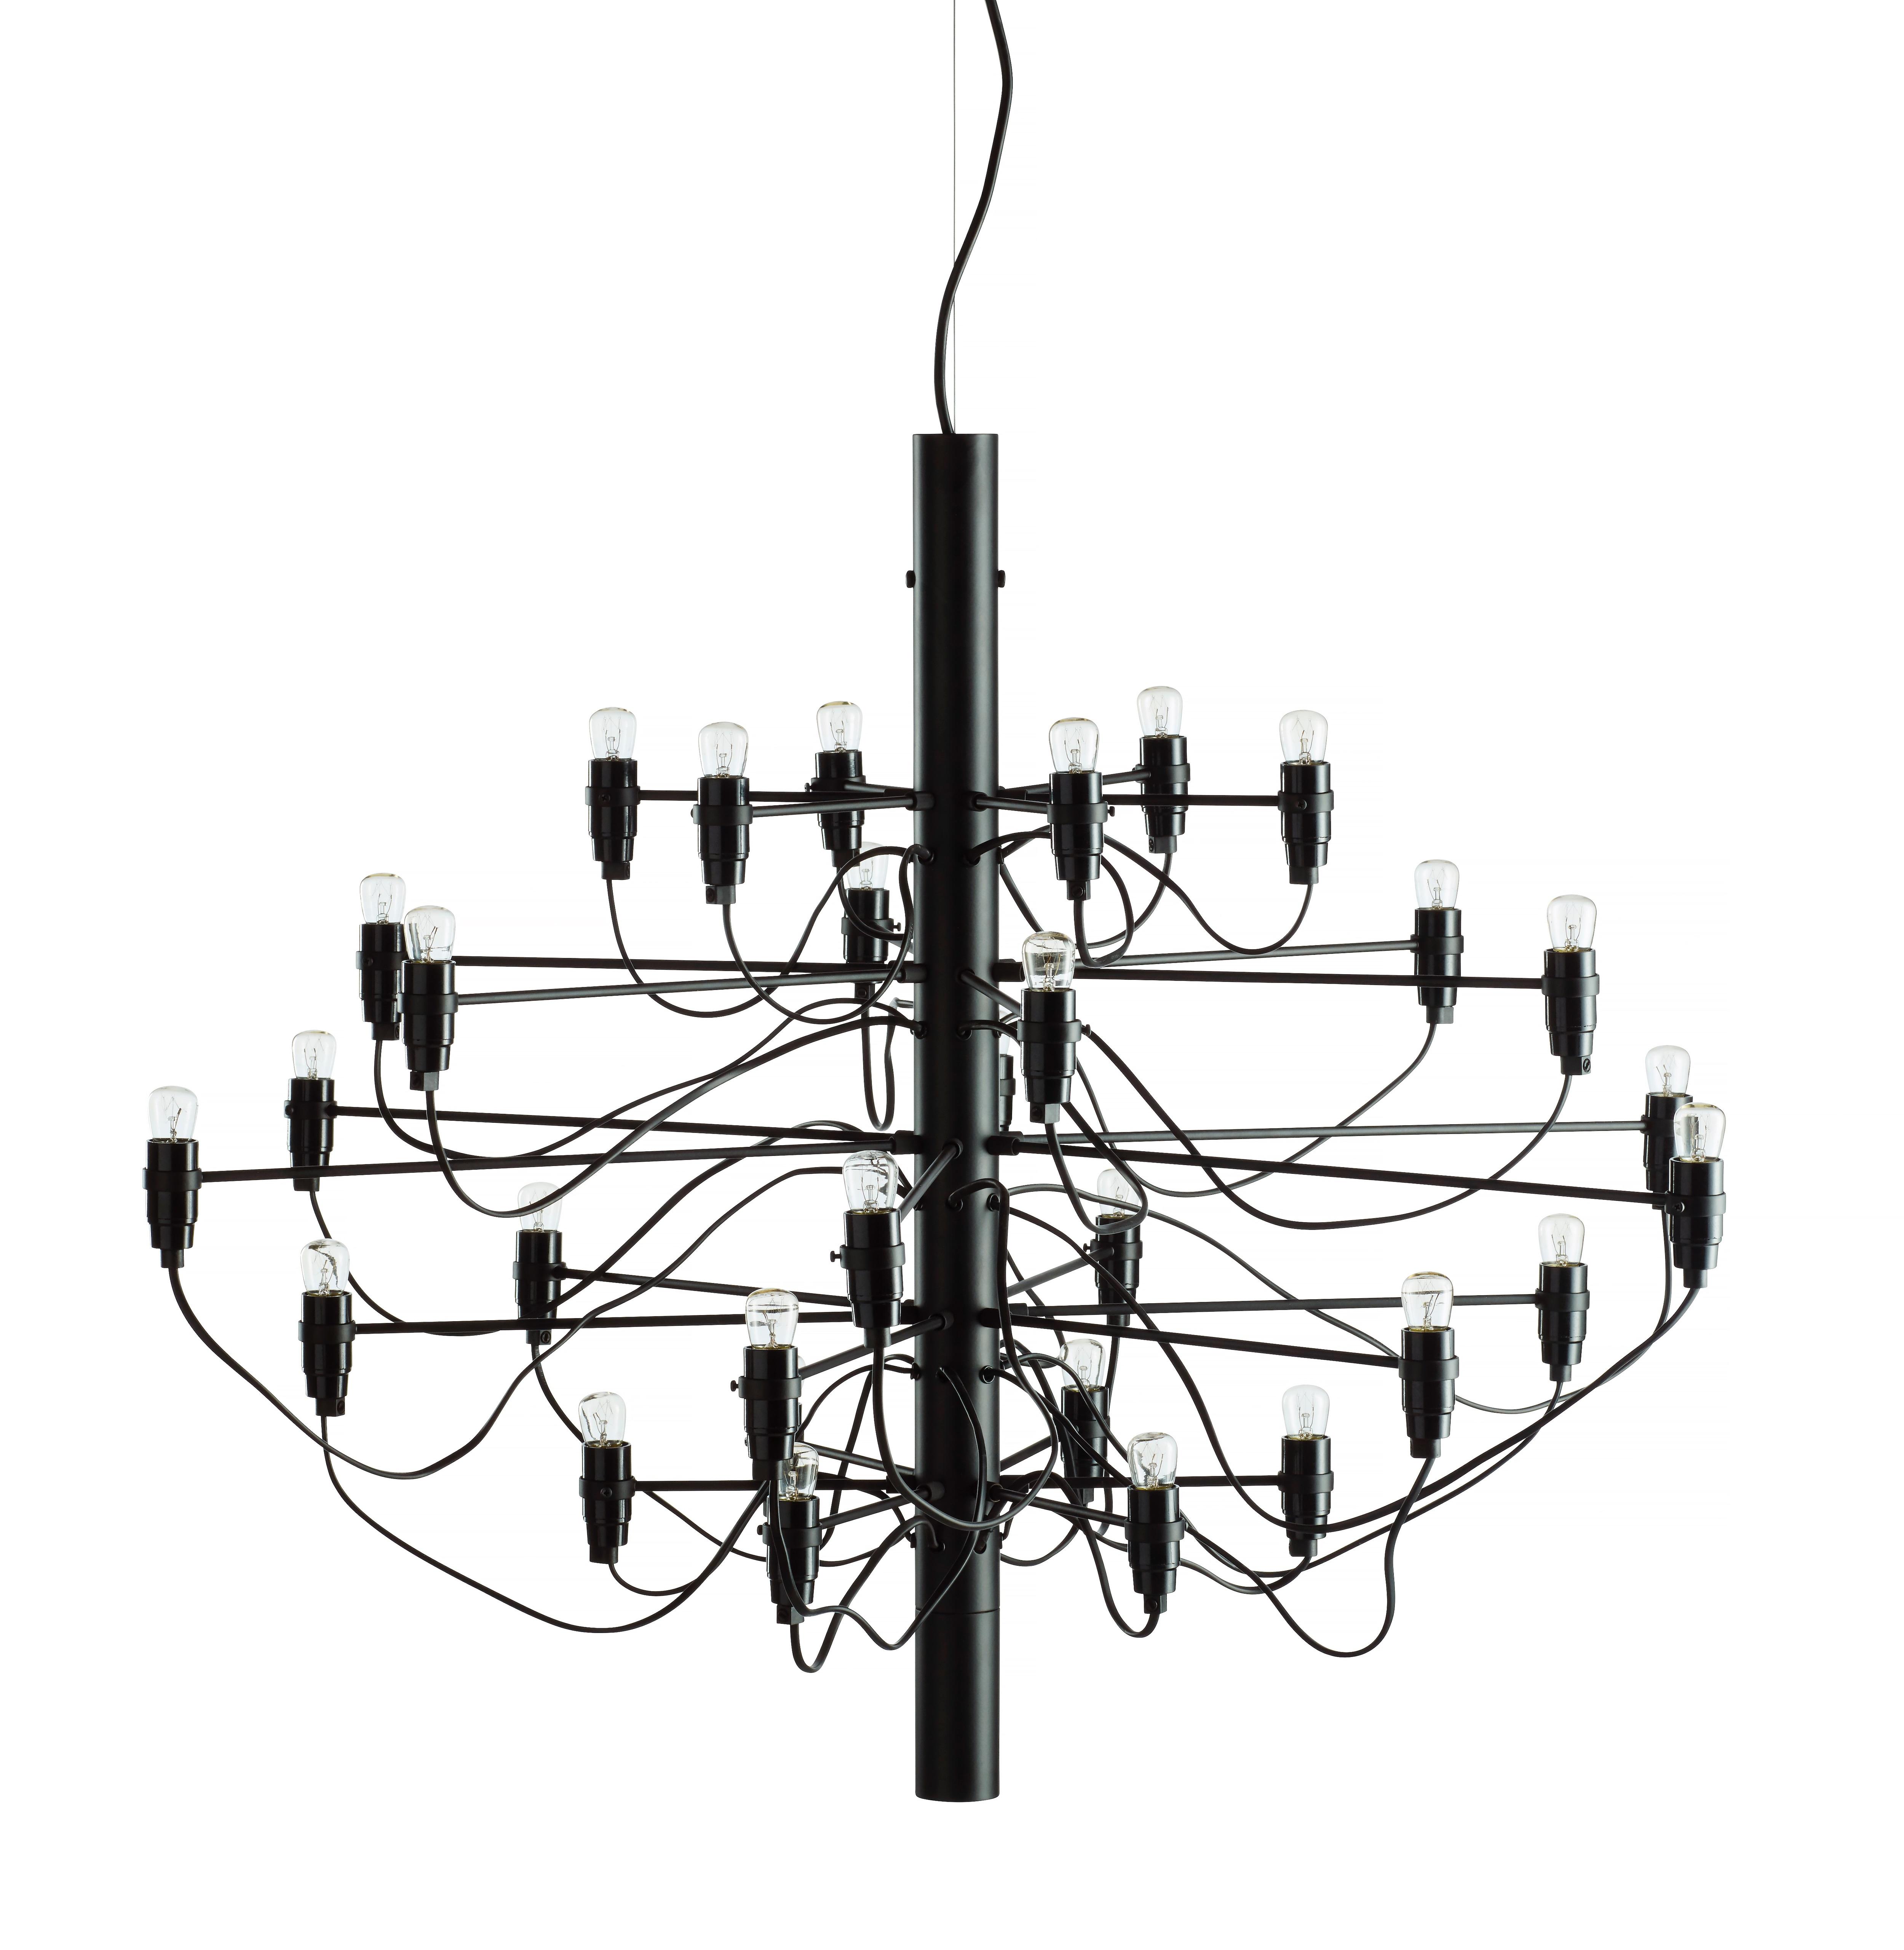 2097/30 Sarfatti LED Taklampa svart